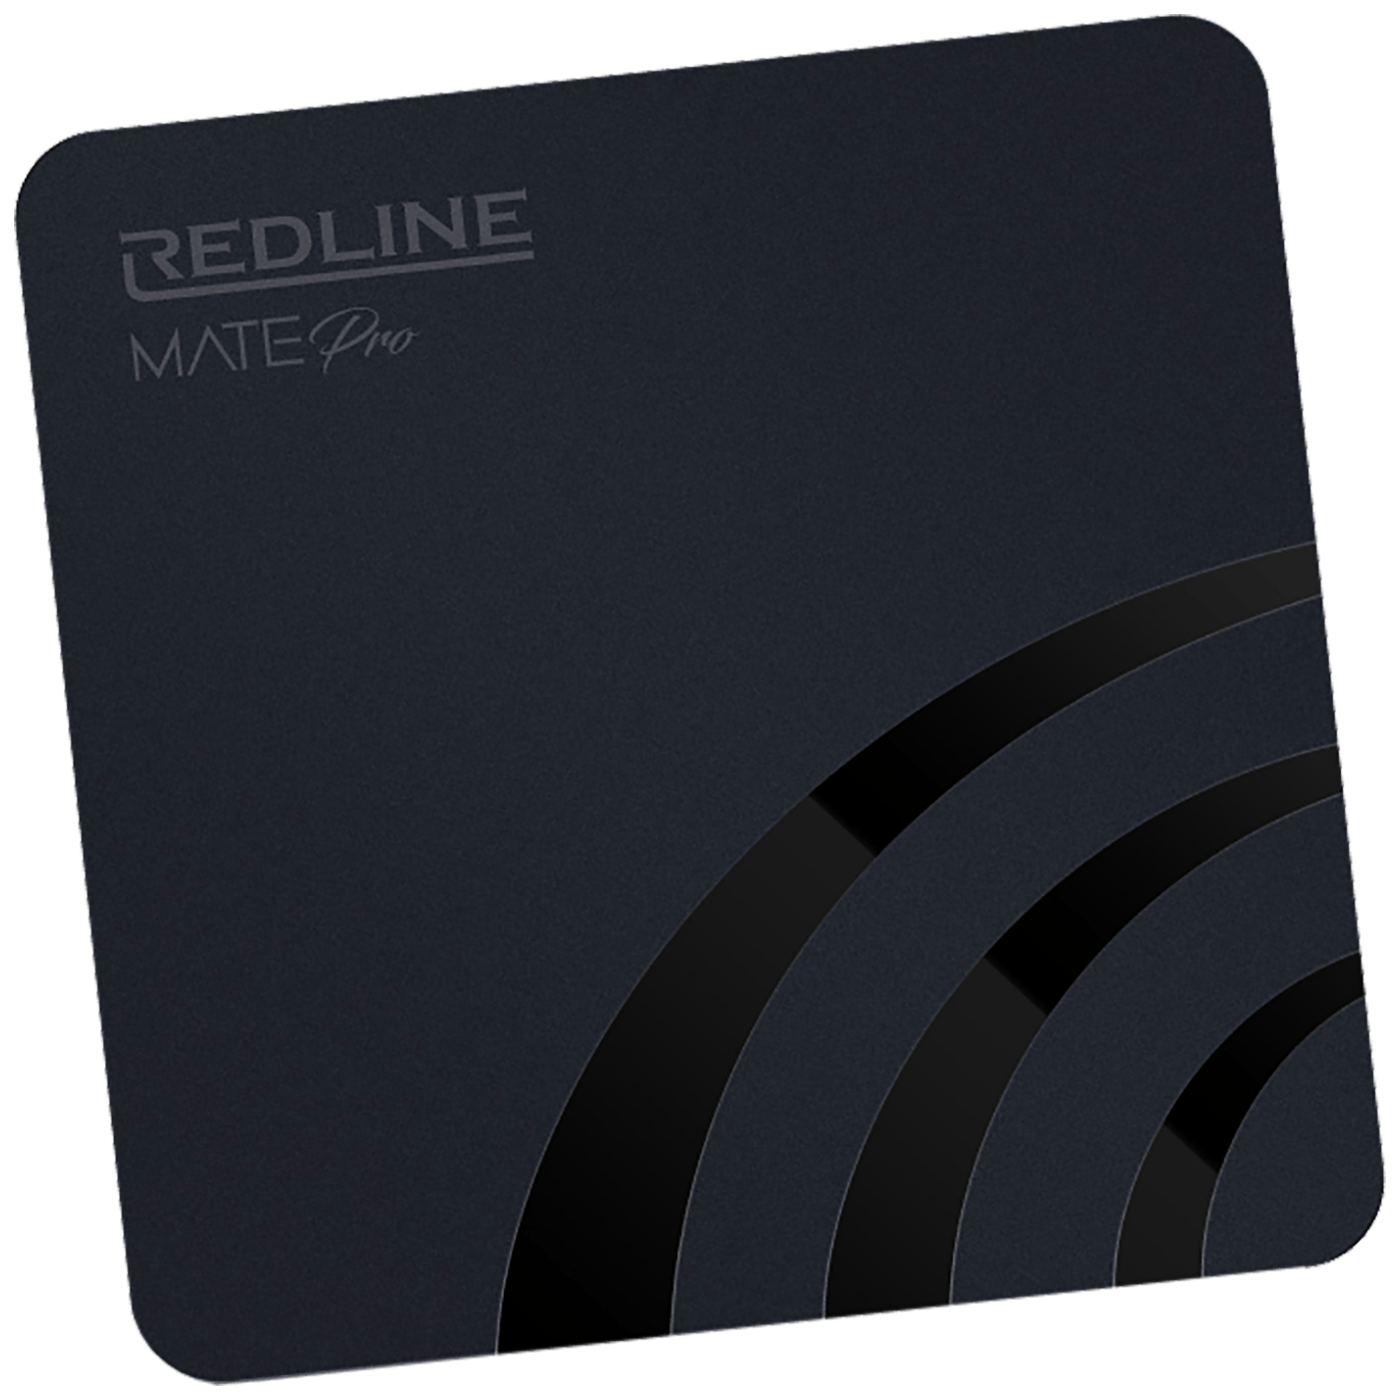 Prijemnik Android , 4/32GB , UltraHD 4K, HDR, LAN/WiFi, HDMI